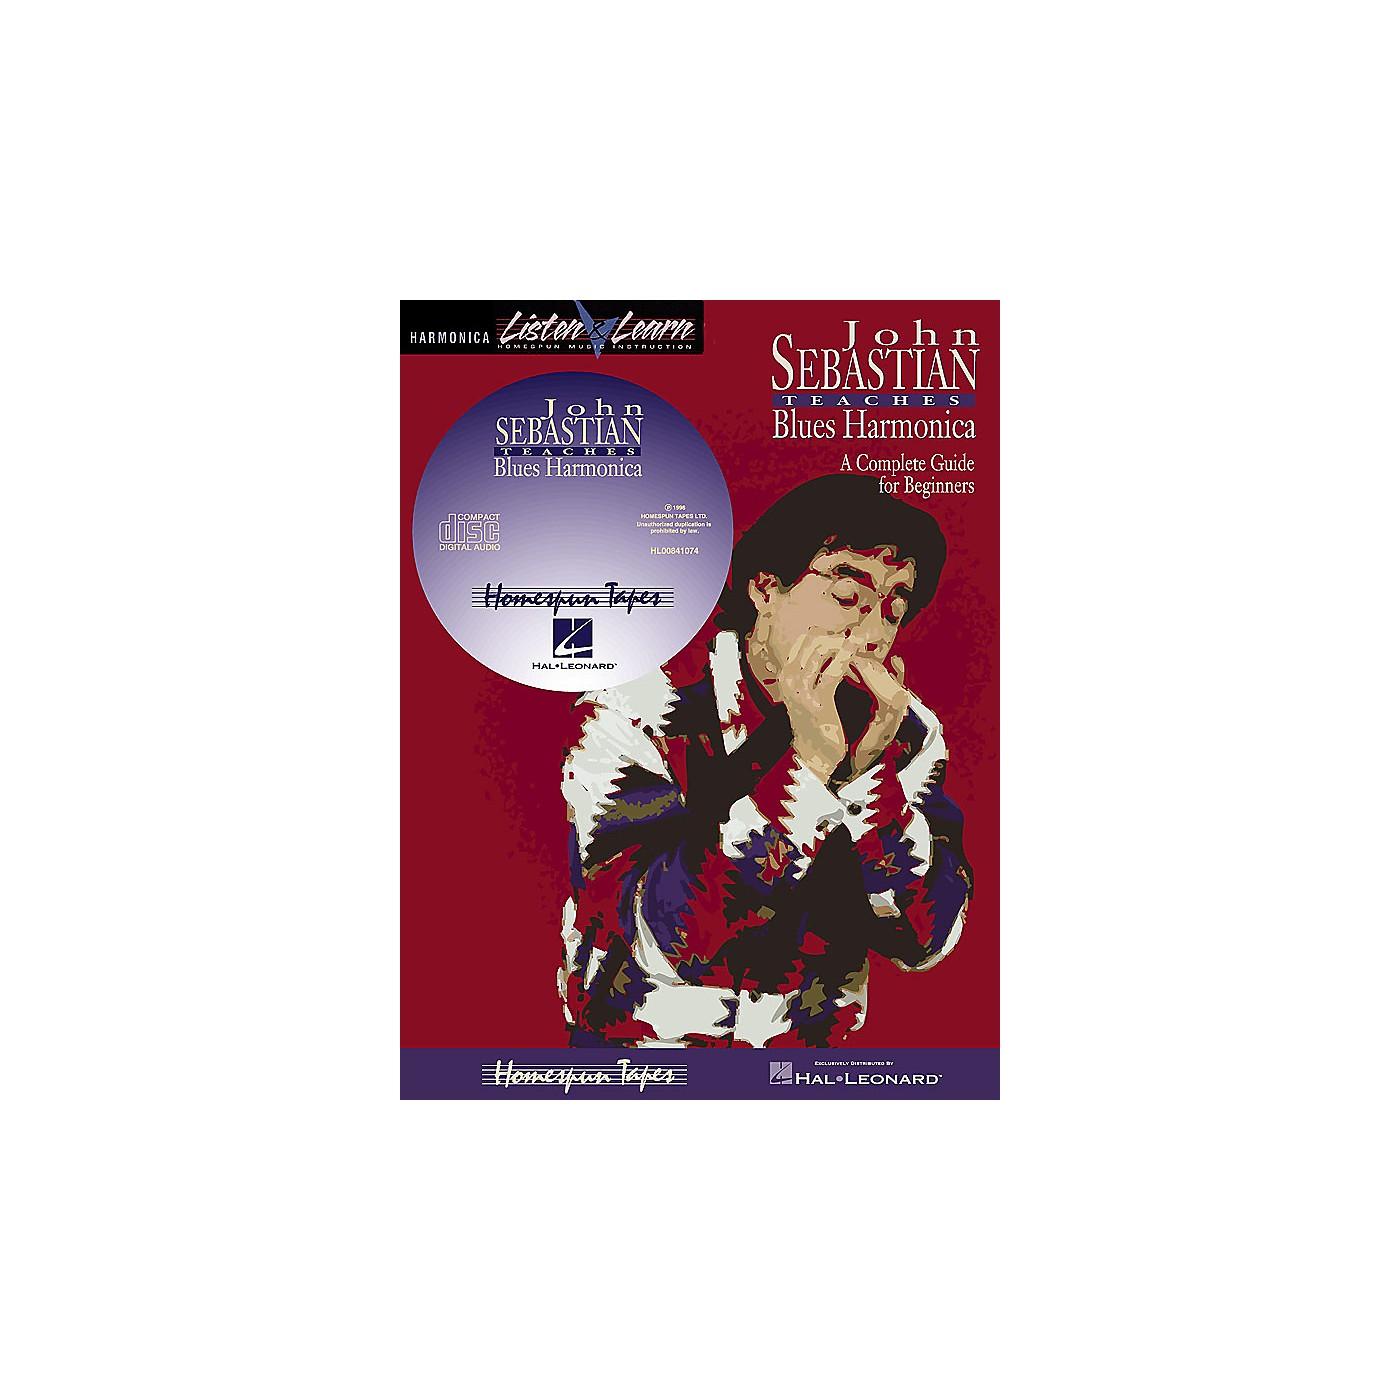 Homespun John Sebastian - Beginning Blues Harmonica Homespun Tapes Series Softcover with CD by John Sebastian thumbnail